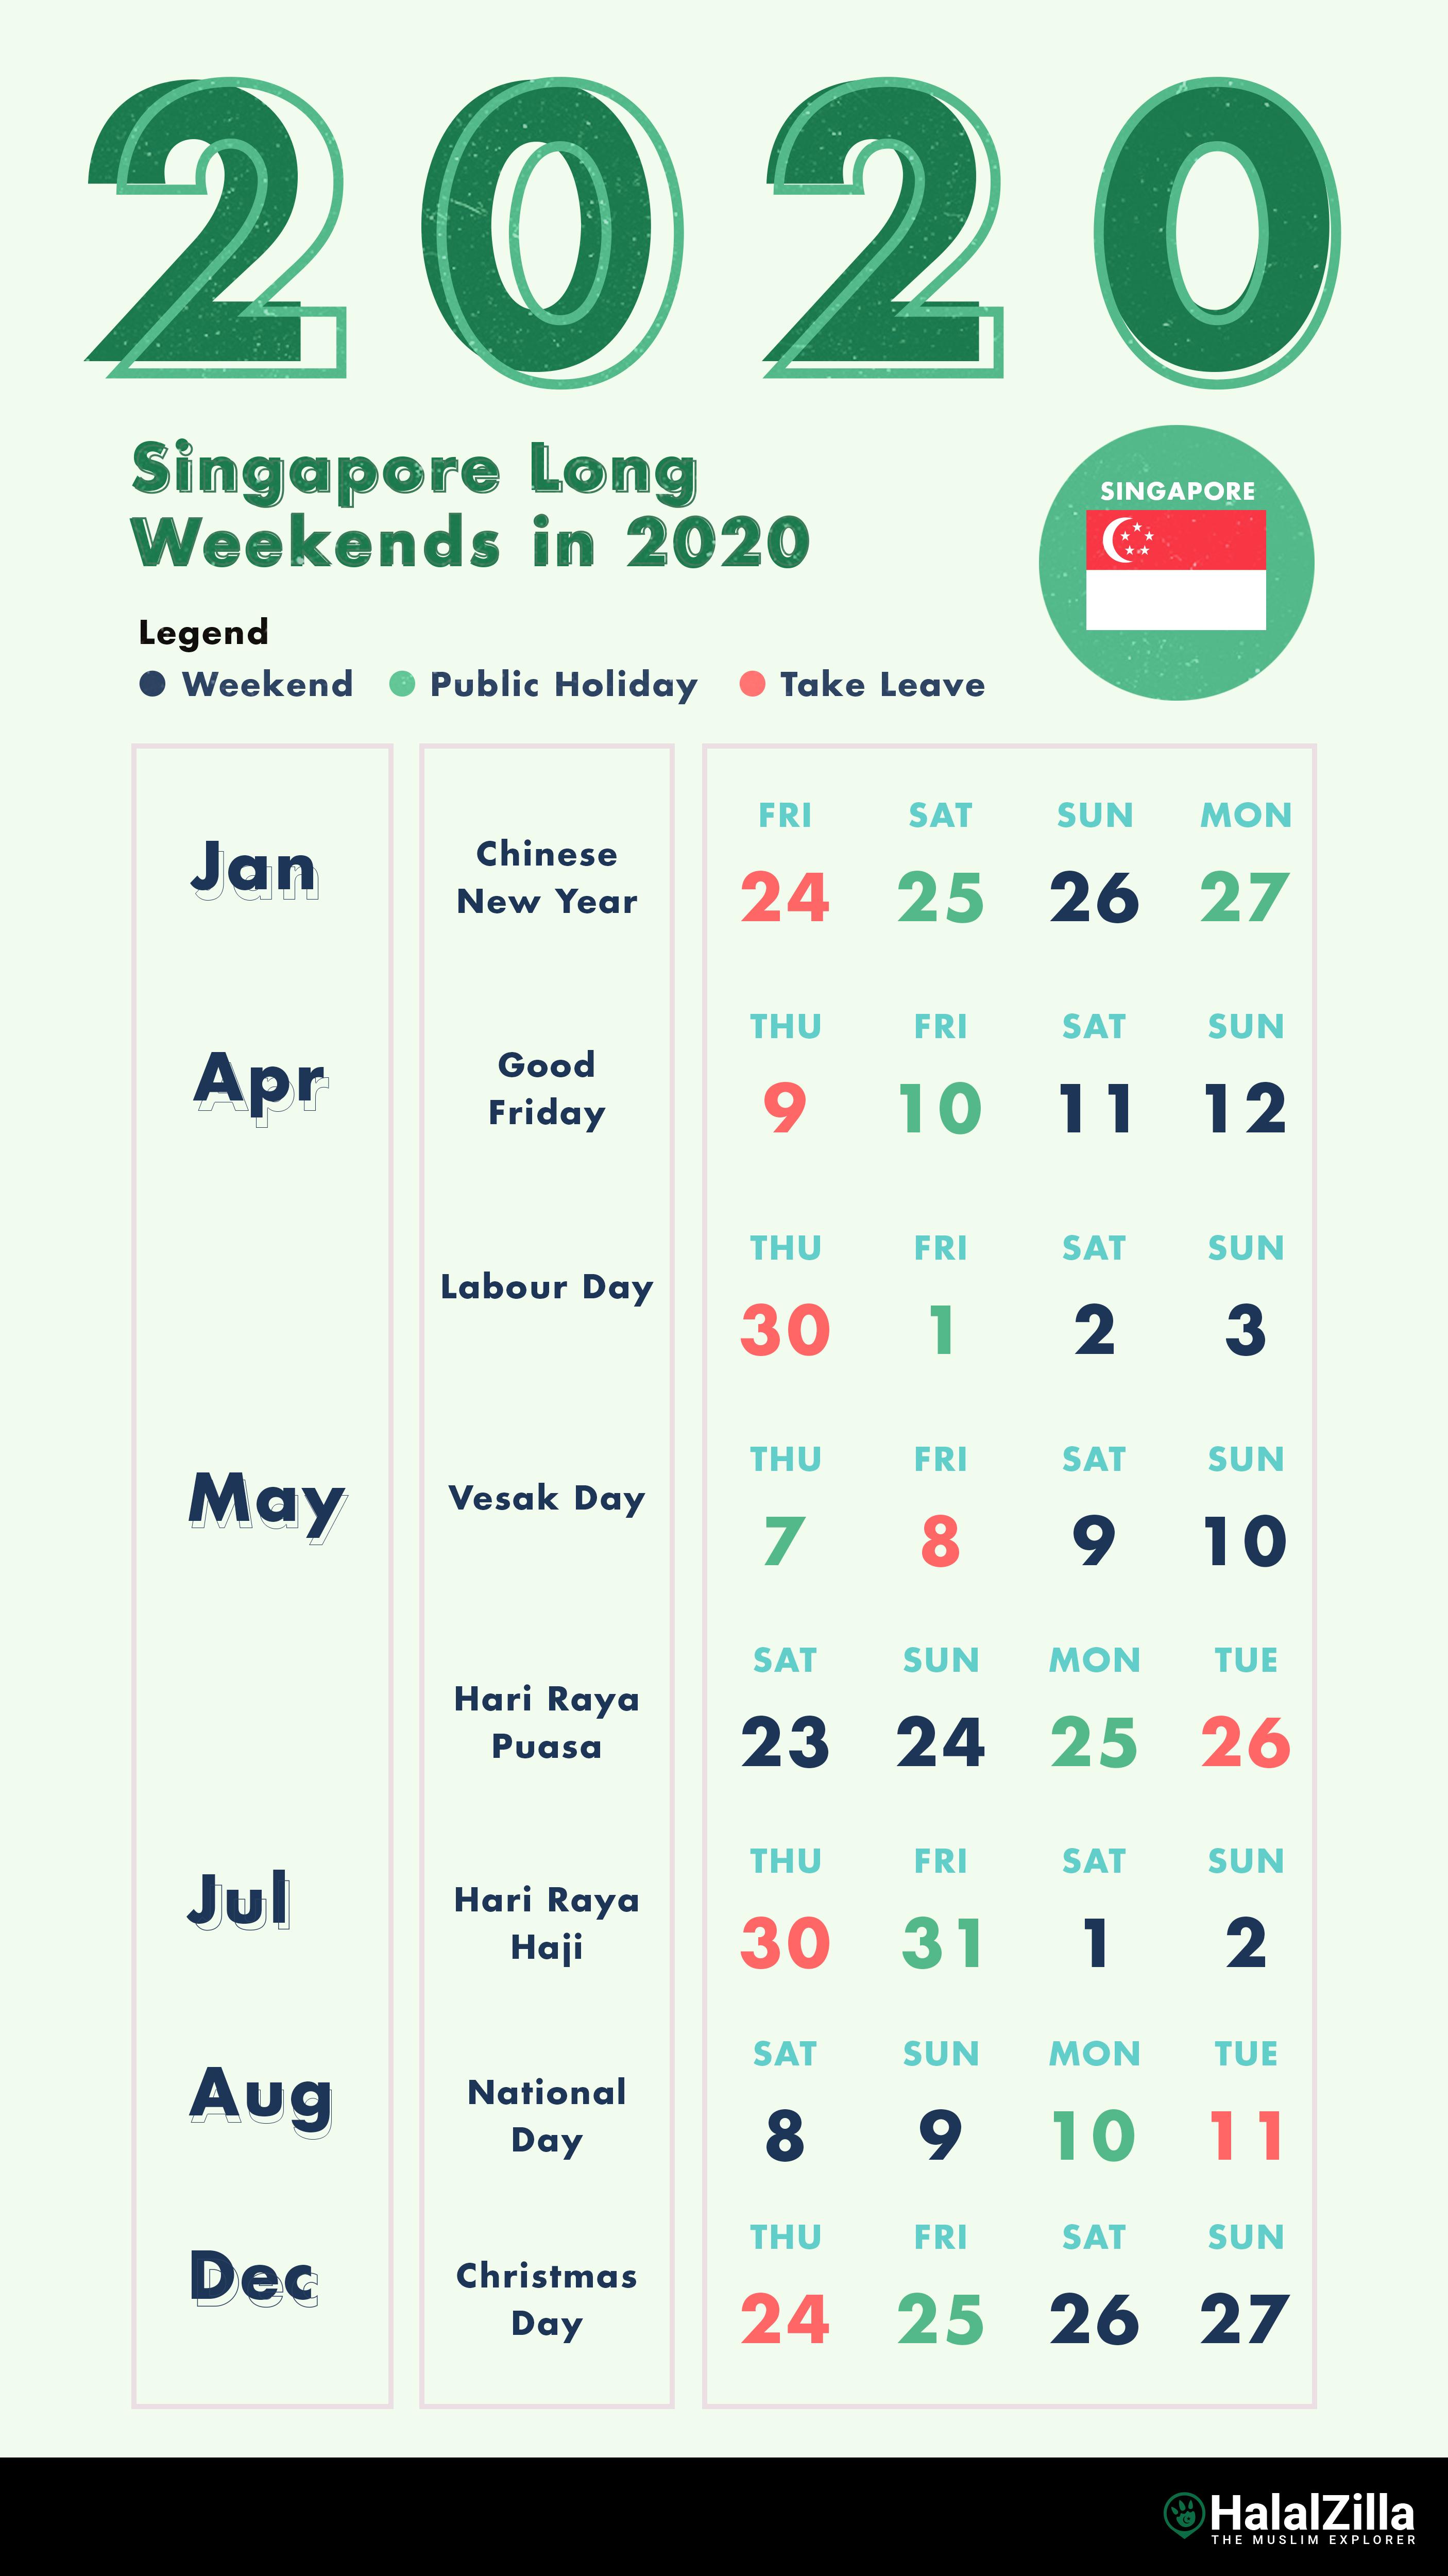 8 Long Weekends In Singapore In 2020 - Halalzilla